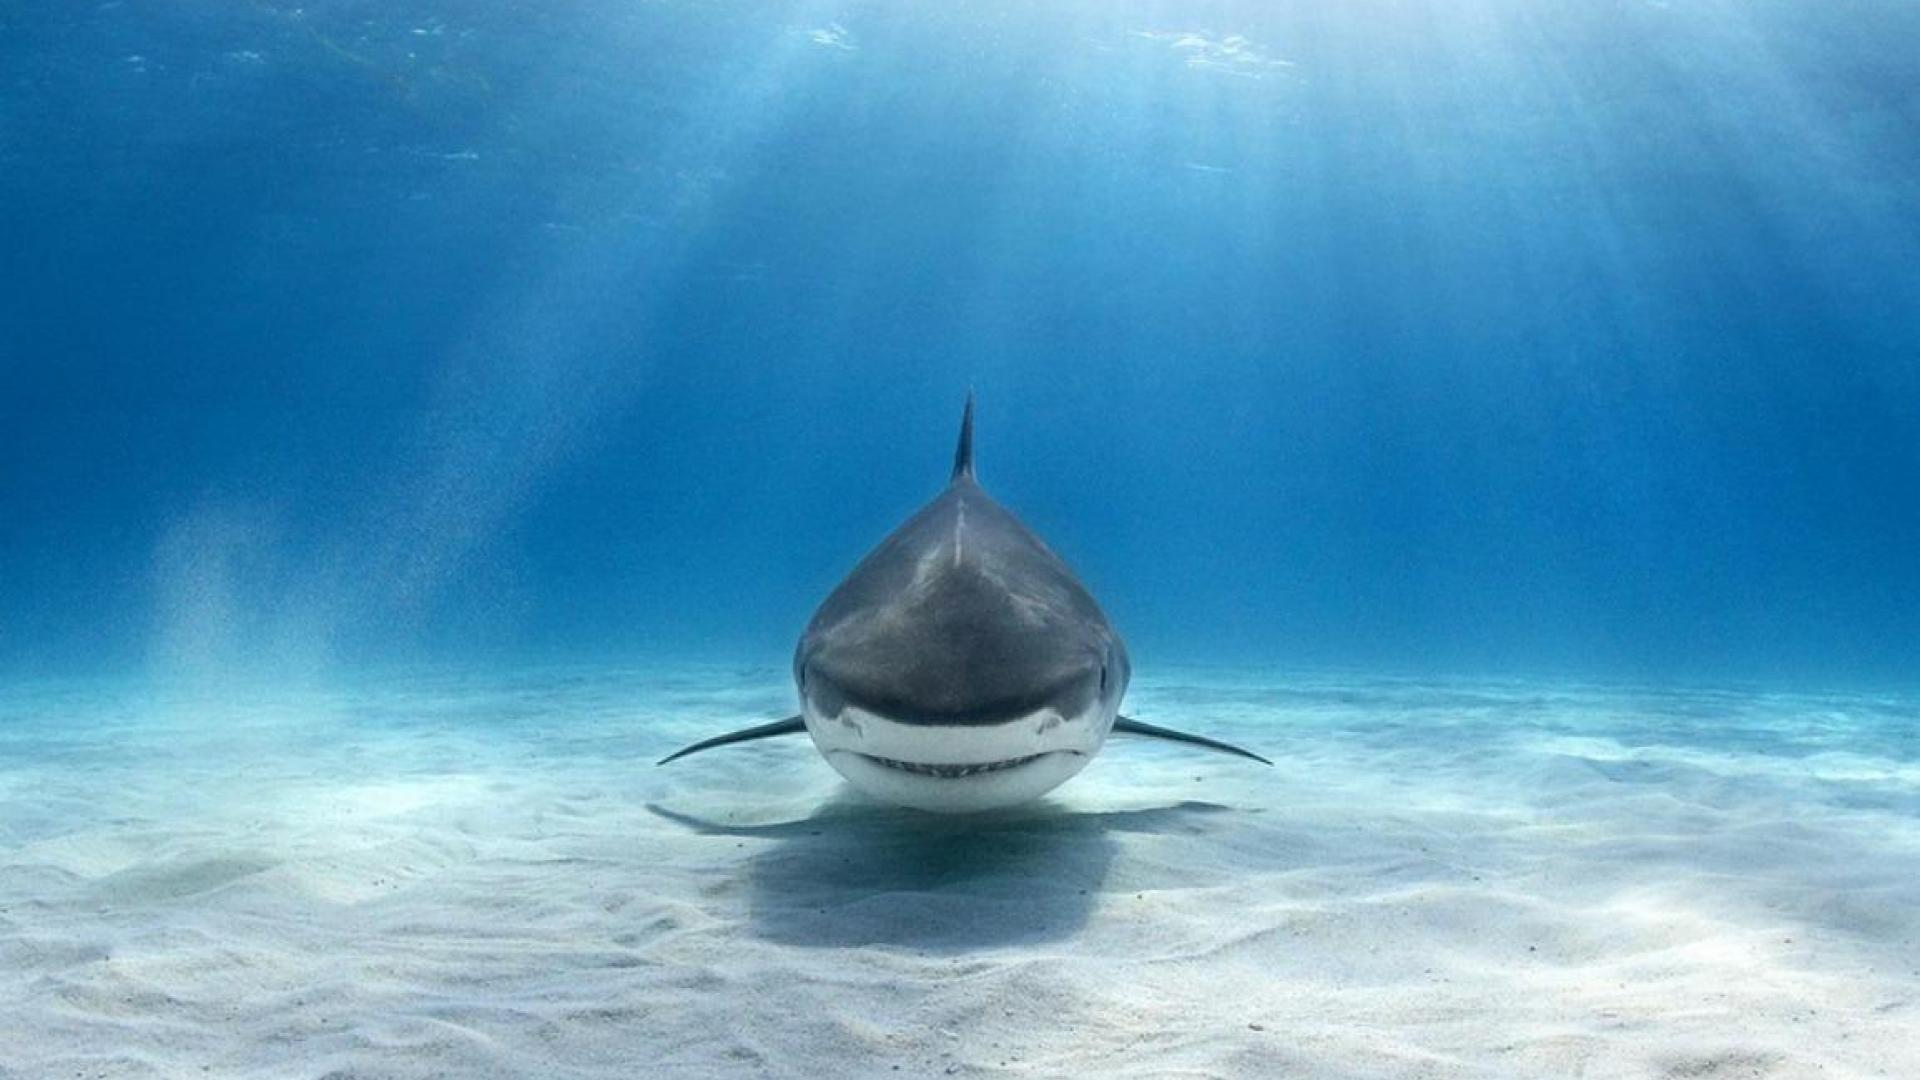 Shark Wallpaper Hd Wallpapers in Animals Imagescicom Xpx